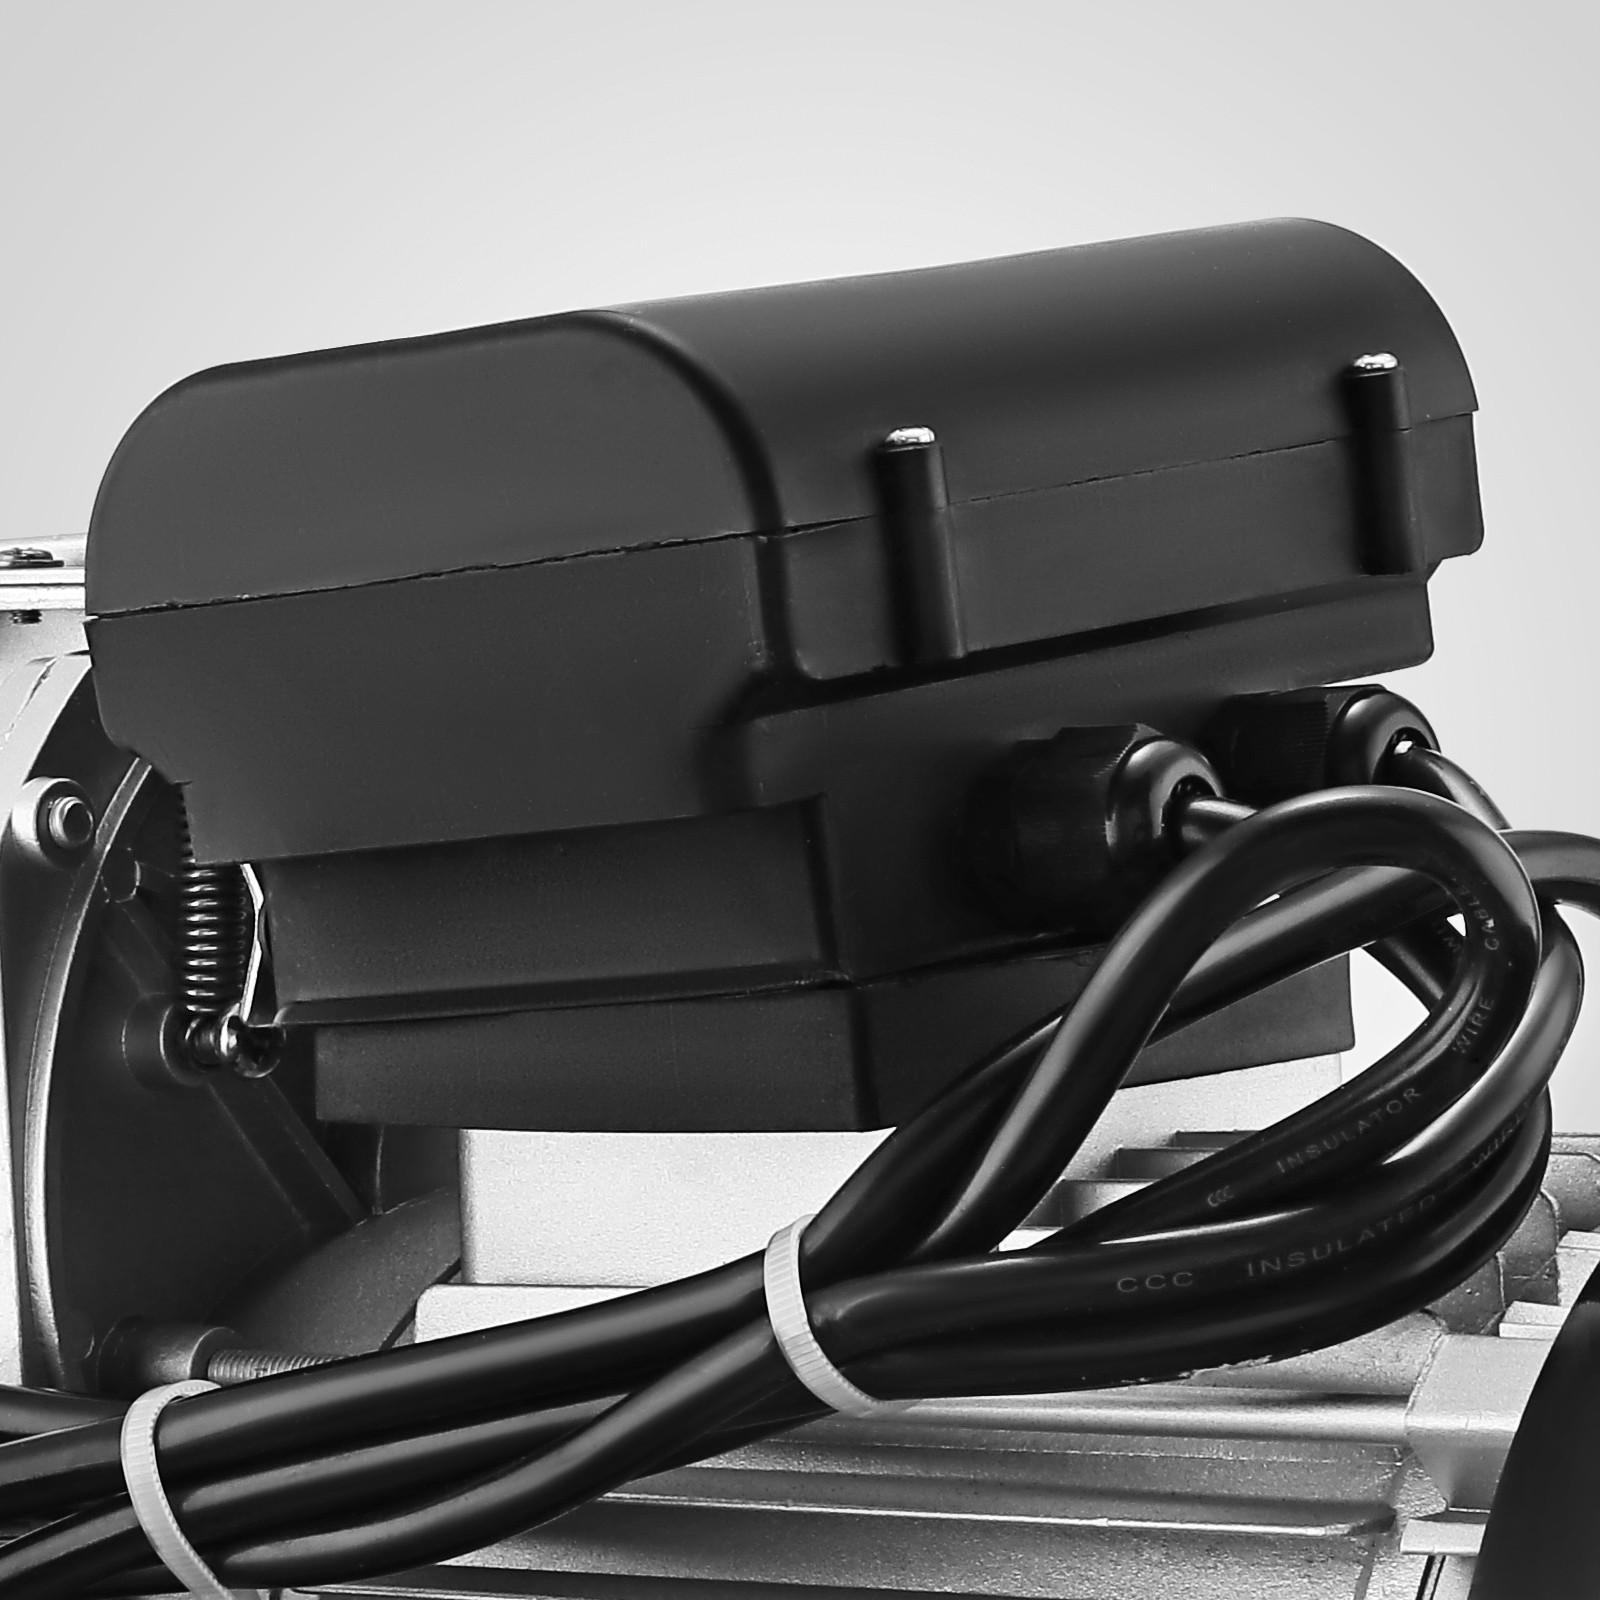 100kg-900kg-Electric-Hoist-Winch-Lifting-Engine-Crane-Cable-Lift-Hook-Garage miniature 71